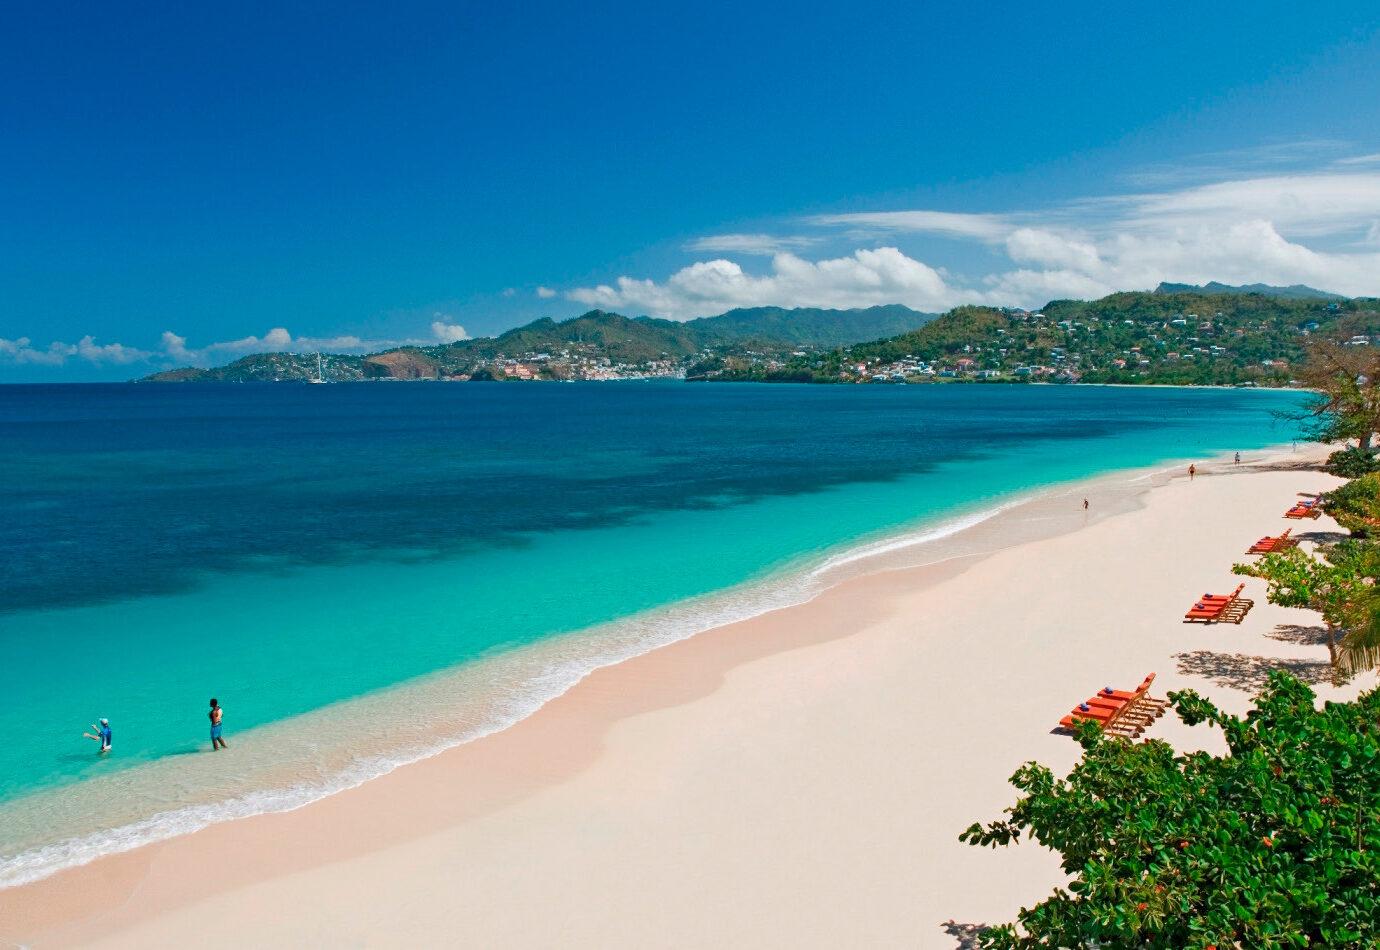 Grand Anse Beach in Grenada